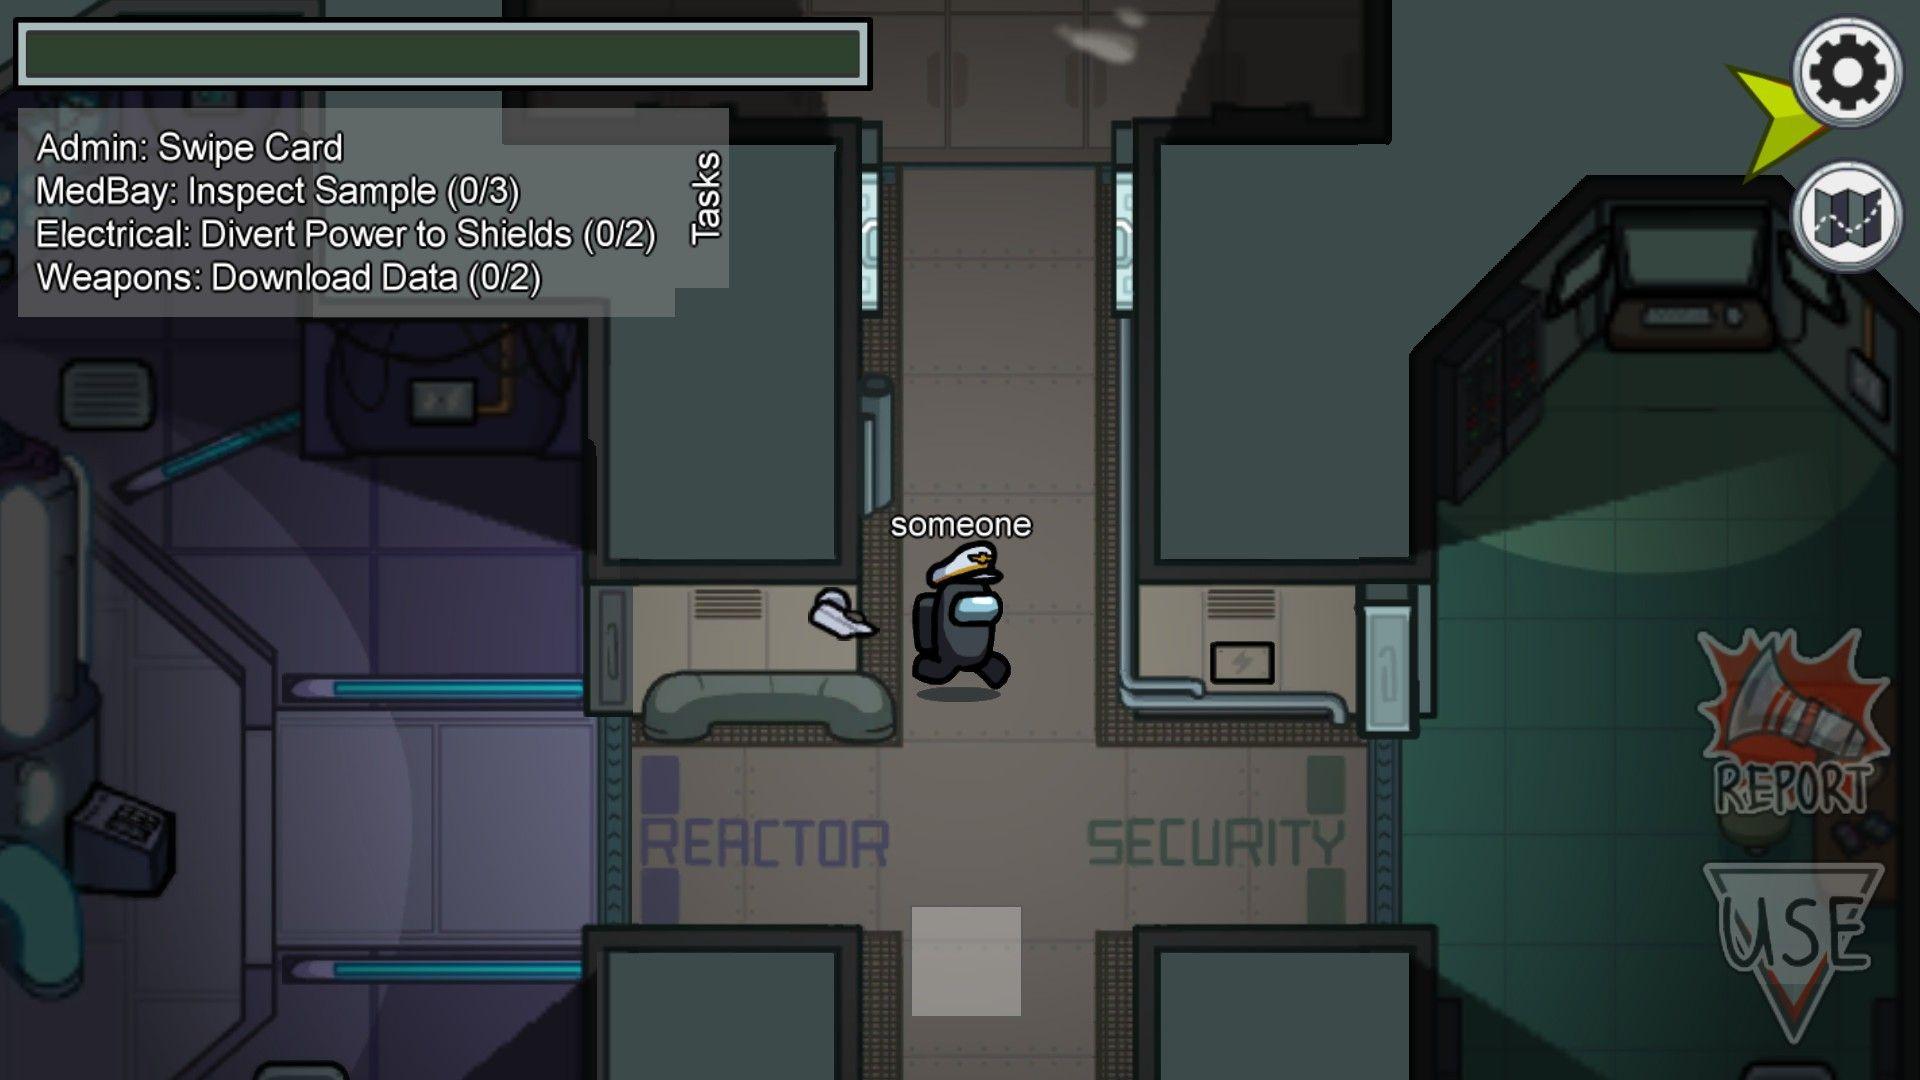 among us gameplay screenshot